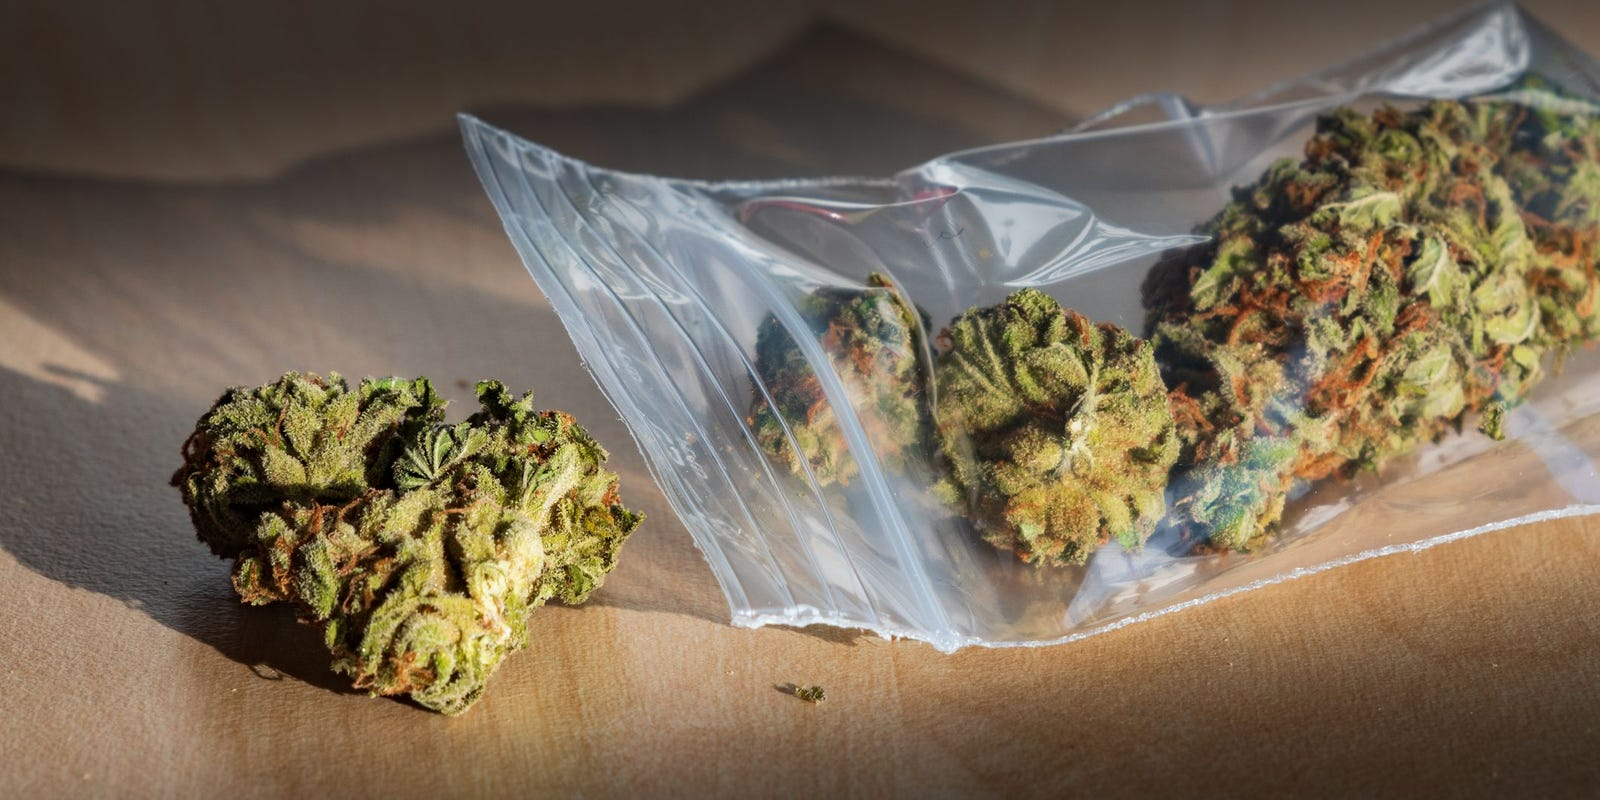 Pennsylvania Gov. Tom Wolf calls for marijuana legalization amid COVID